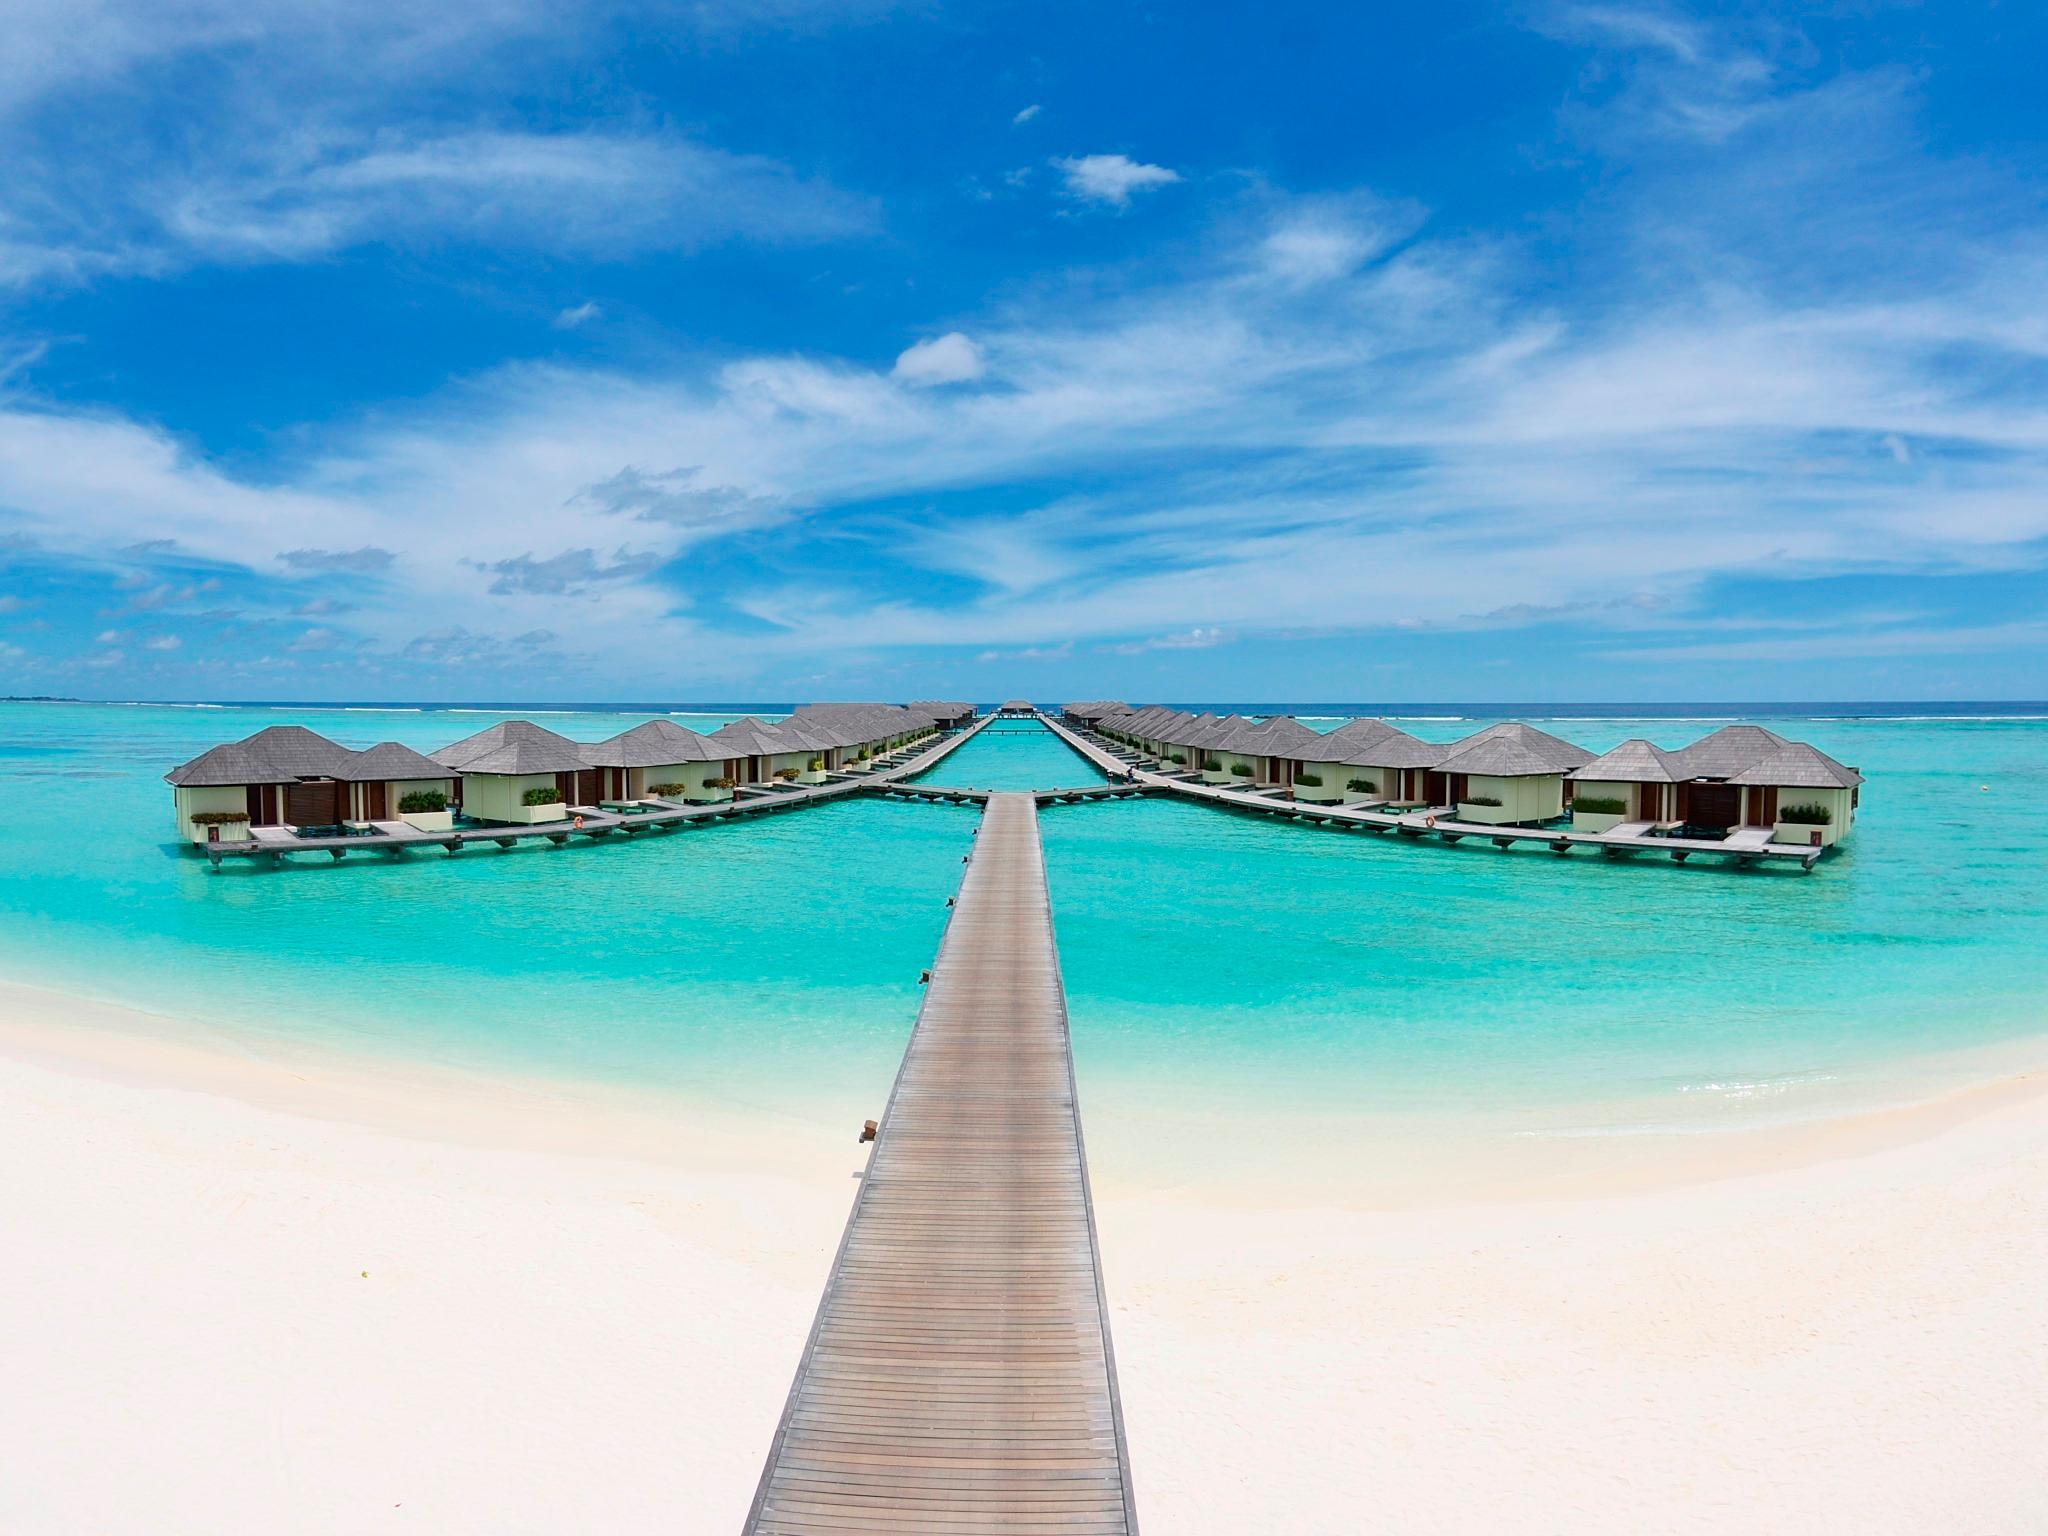 Paradise Island Resort & Spa, Maldives Islands - 5 Star Hotel in Maldives Islands, Maldives